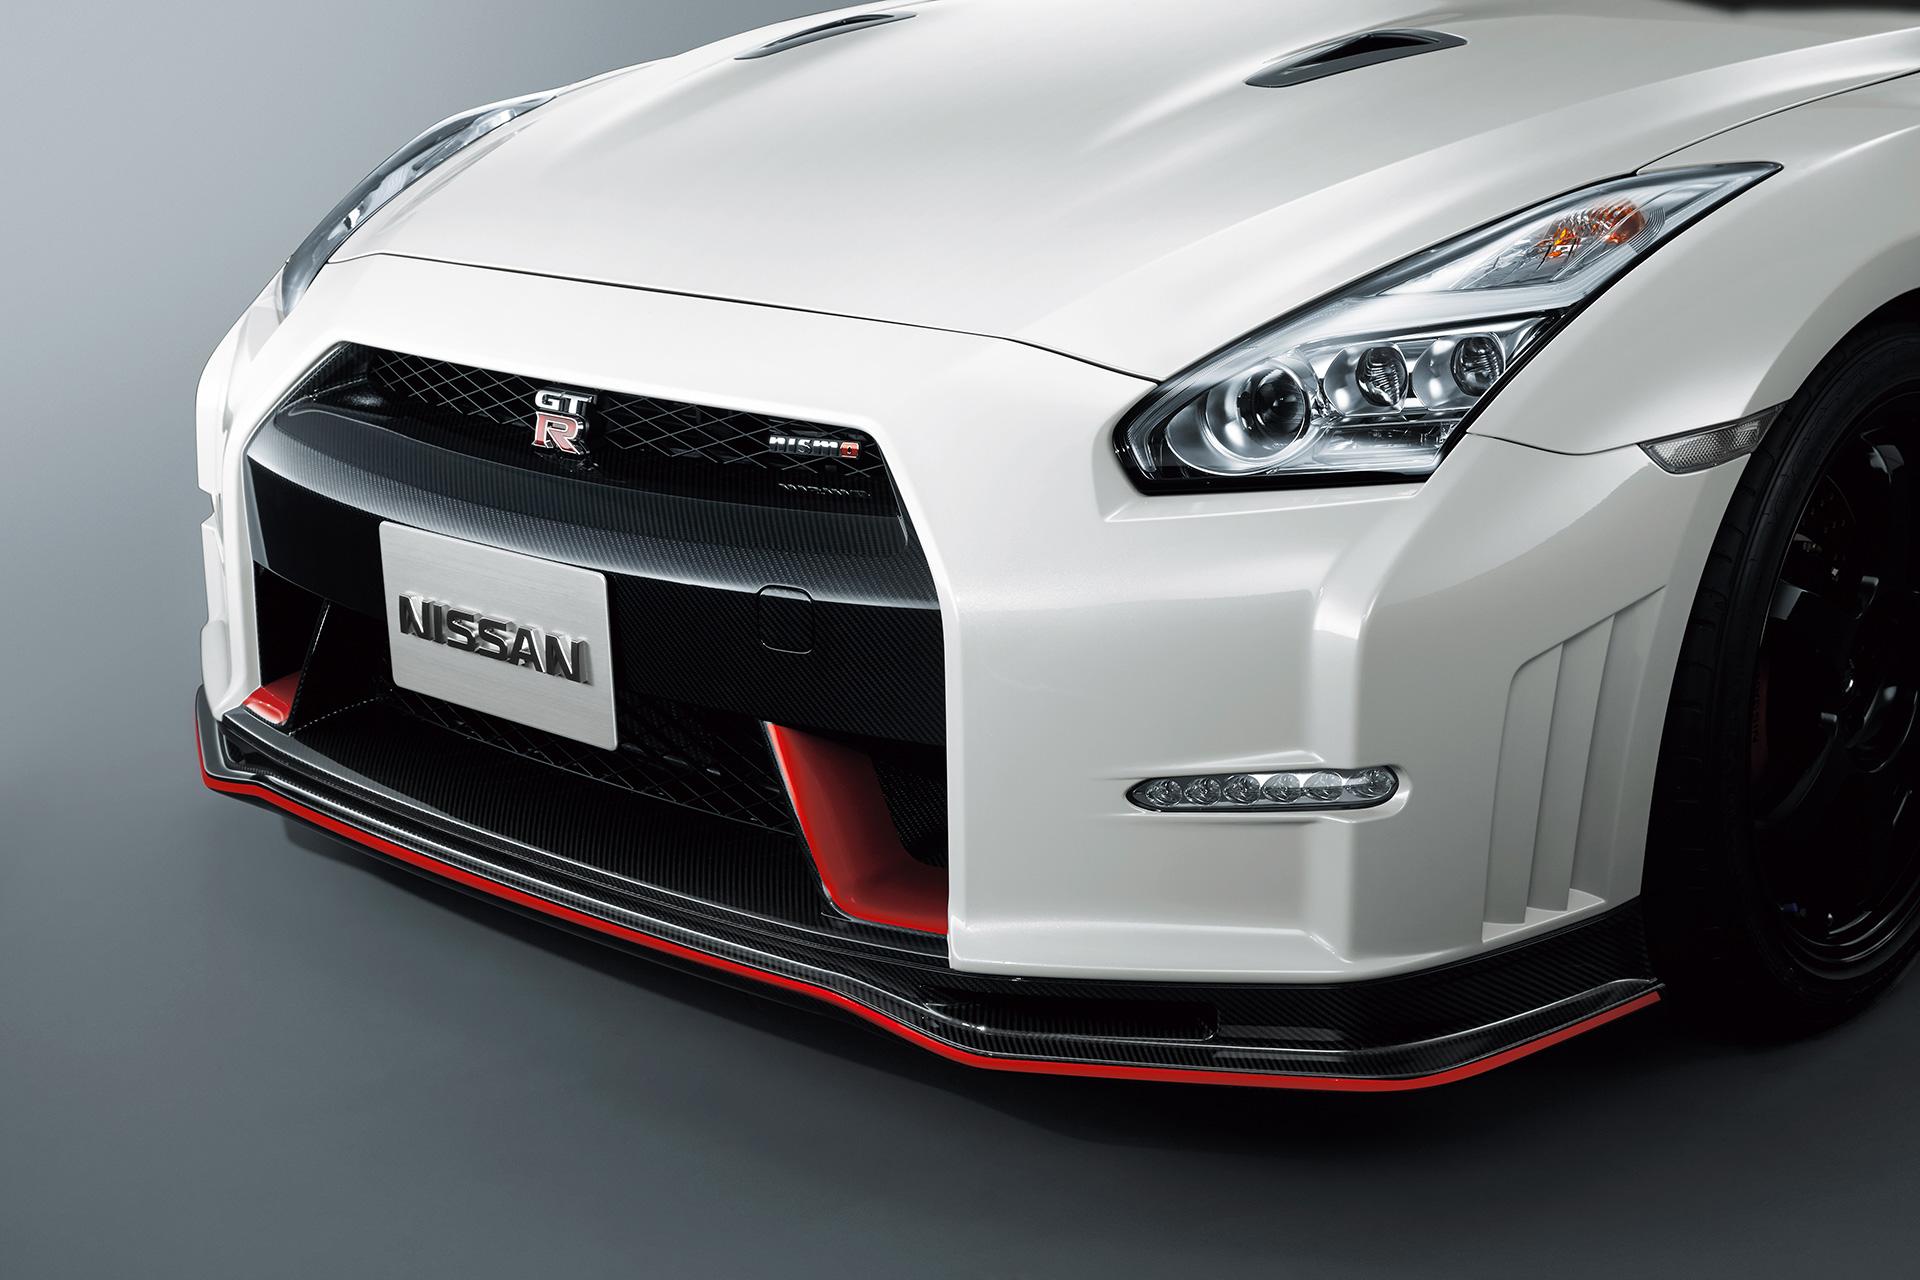 Nissan GT-R NISMO 2015 - profil avant / front side-face